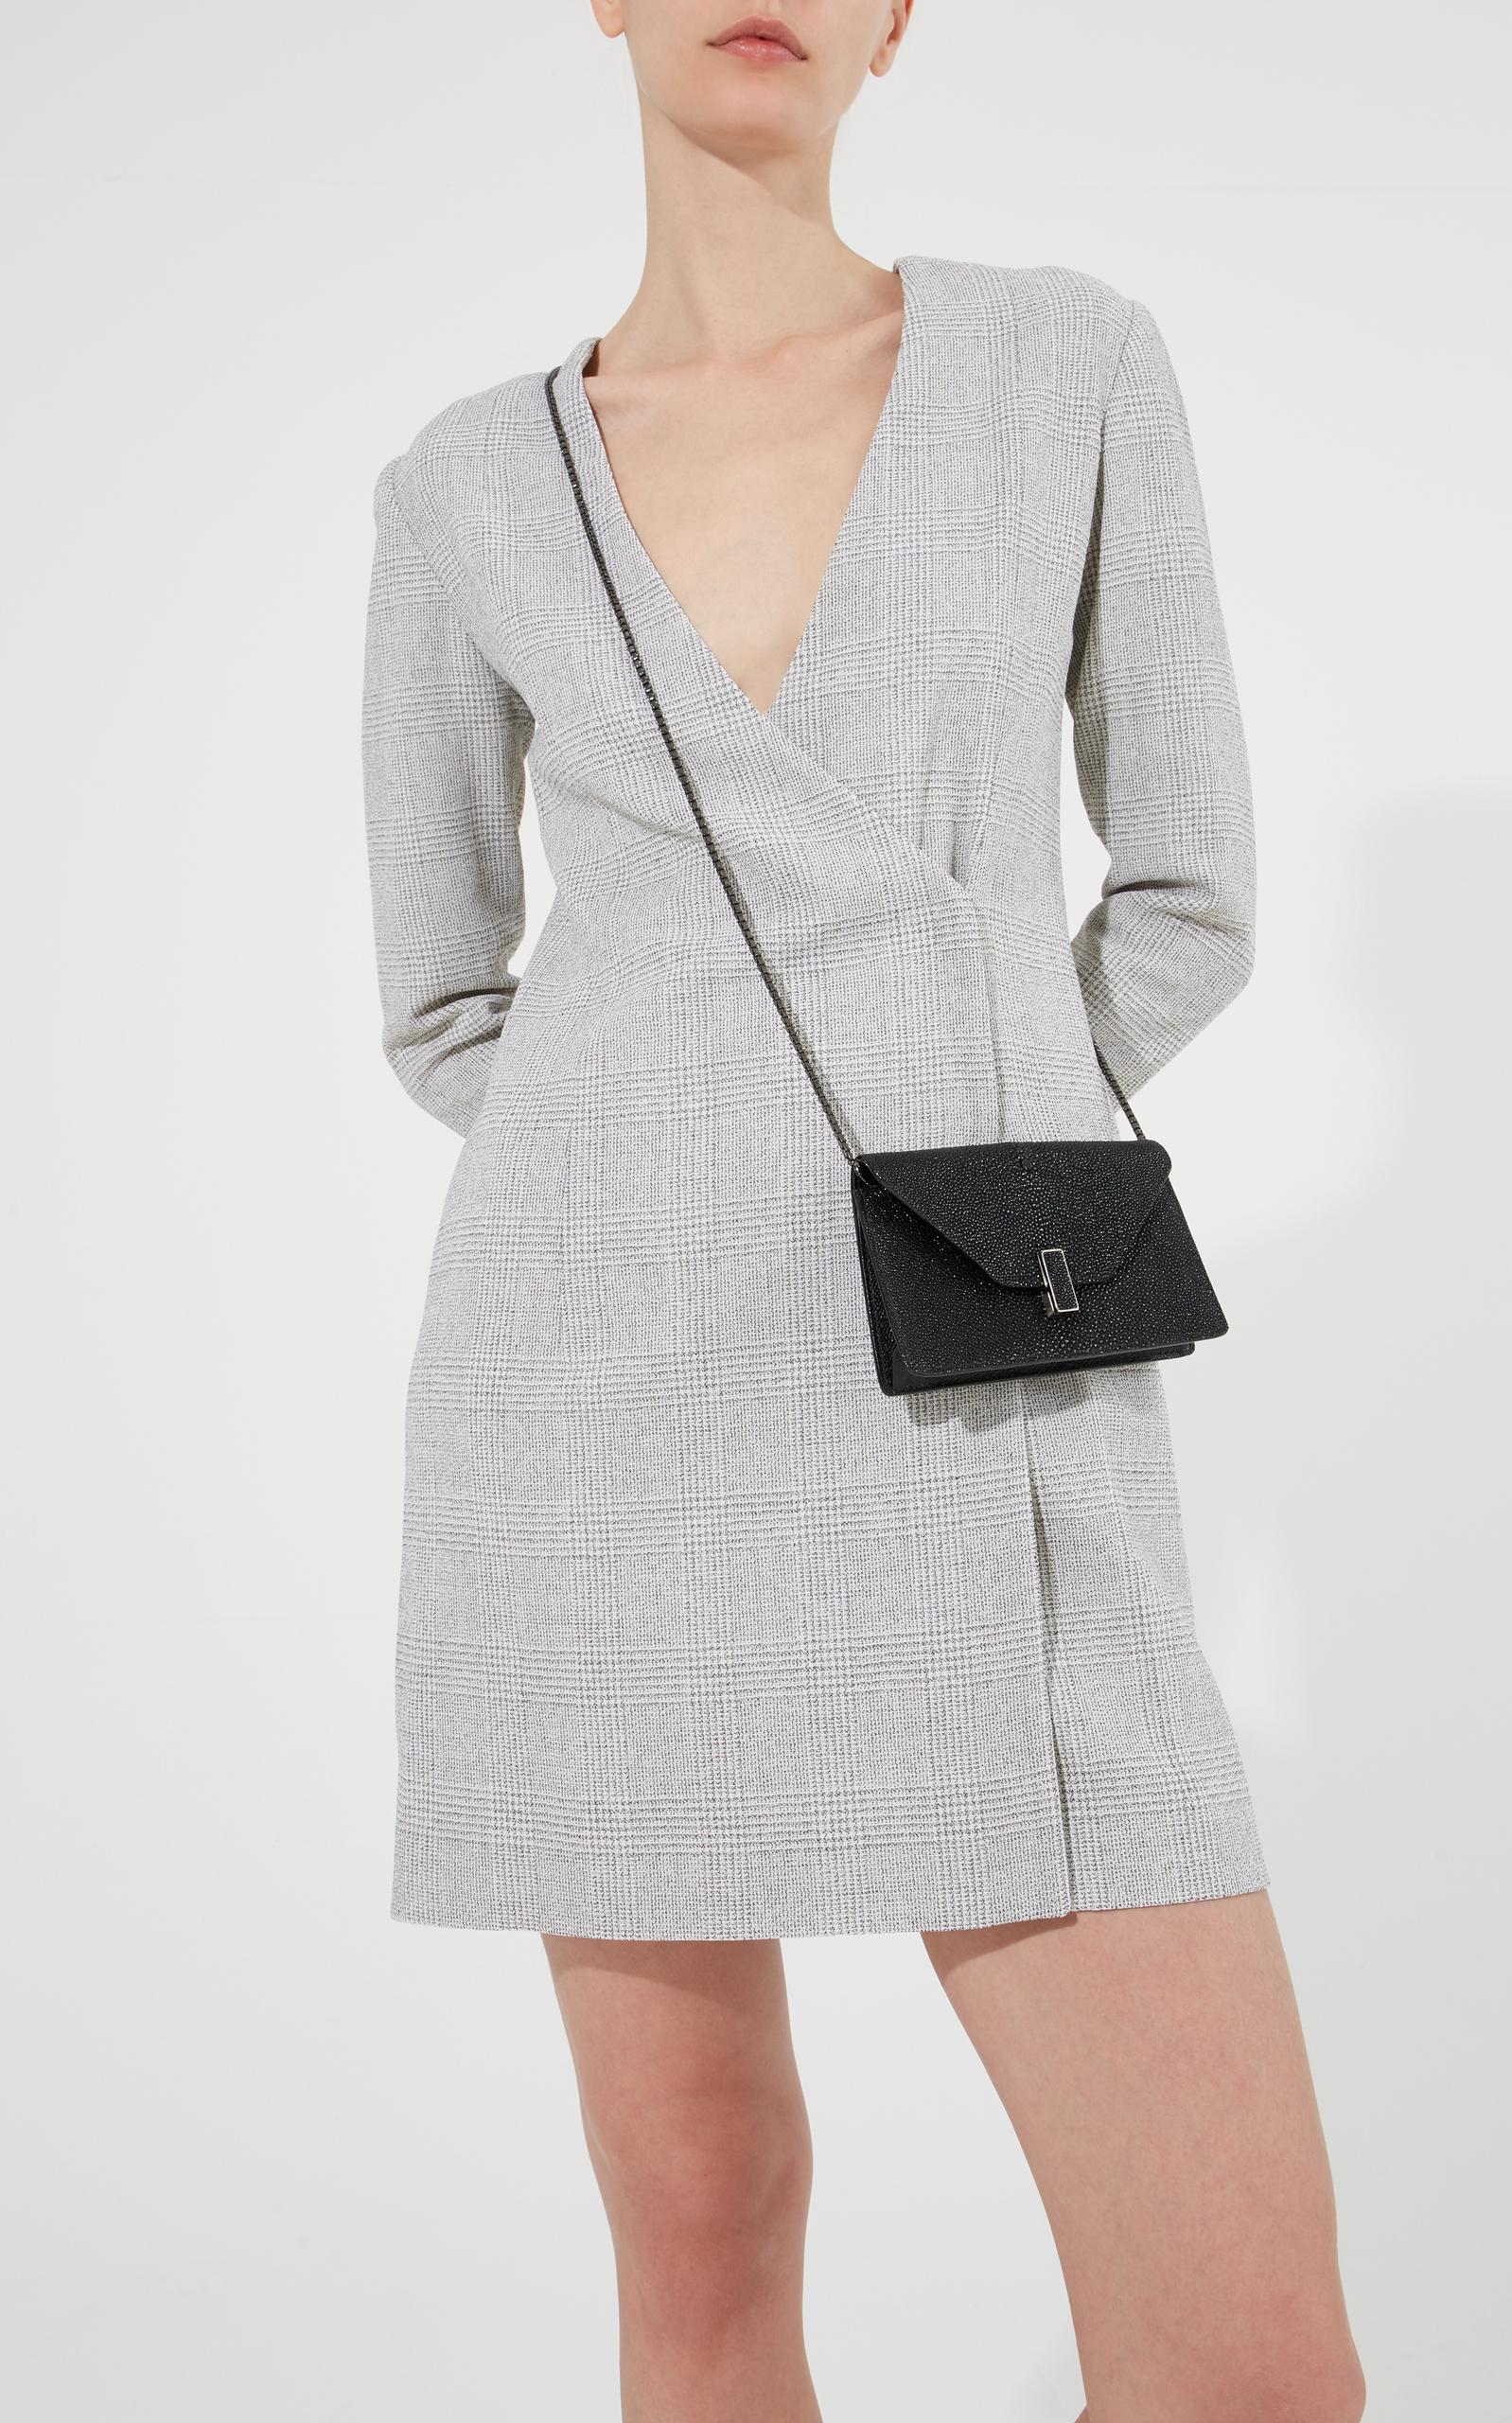 Chain Operandi Iside Bag With Valextra Moda By Evening tfaq0wz